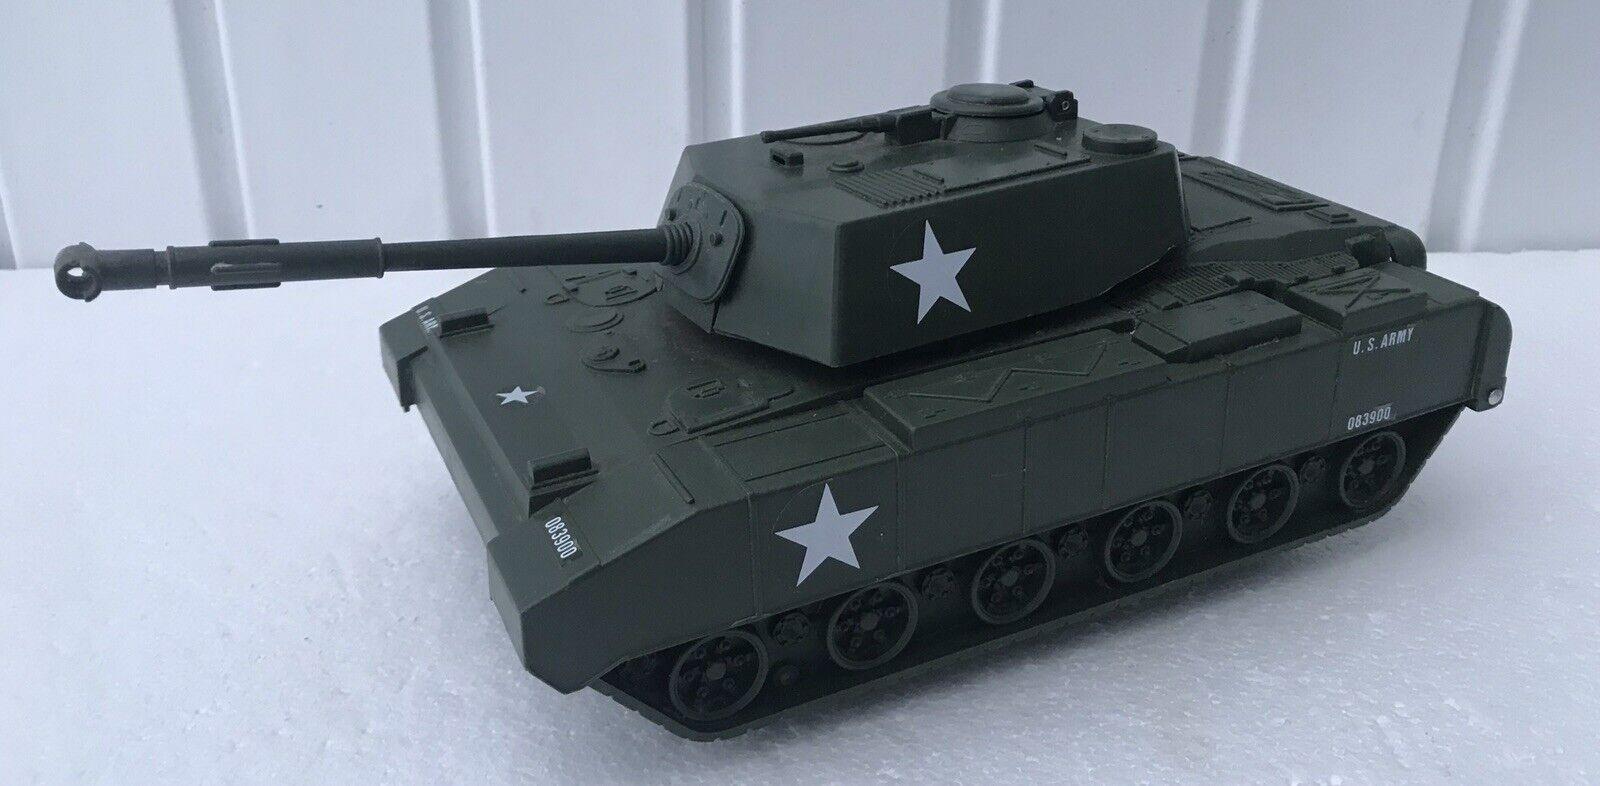 Ultra RARE 1980s Vintage Gi Joe KO US Army Tank Figure Case ZIMA Toys